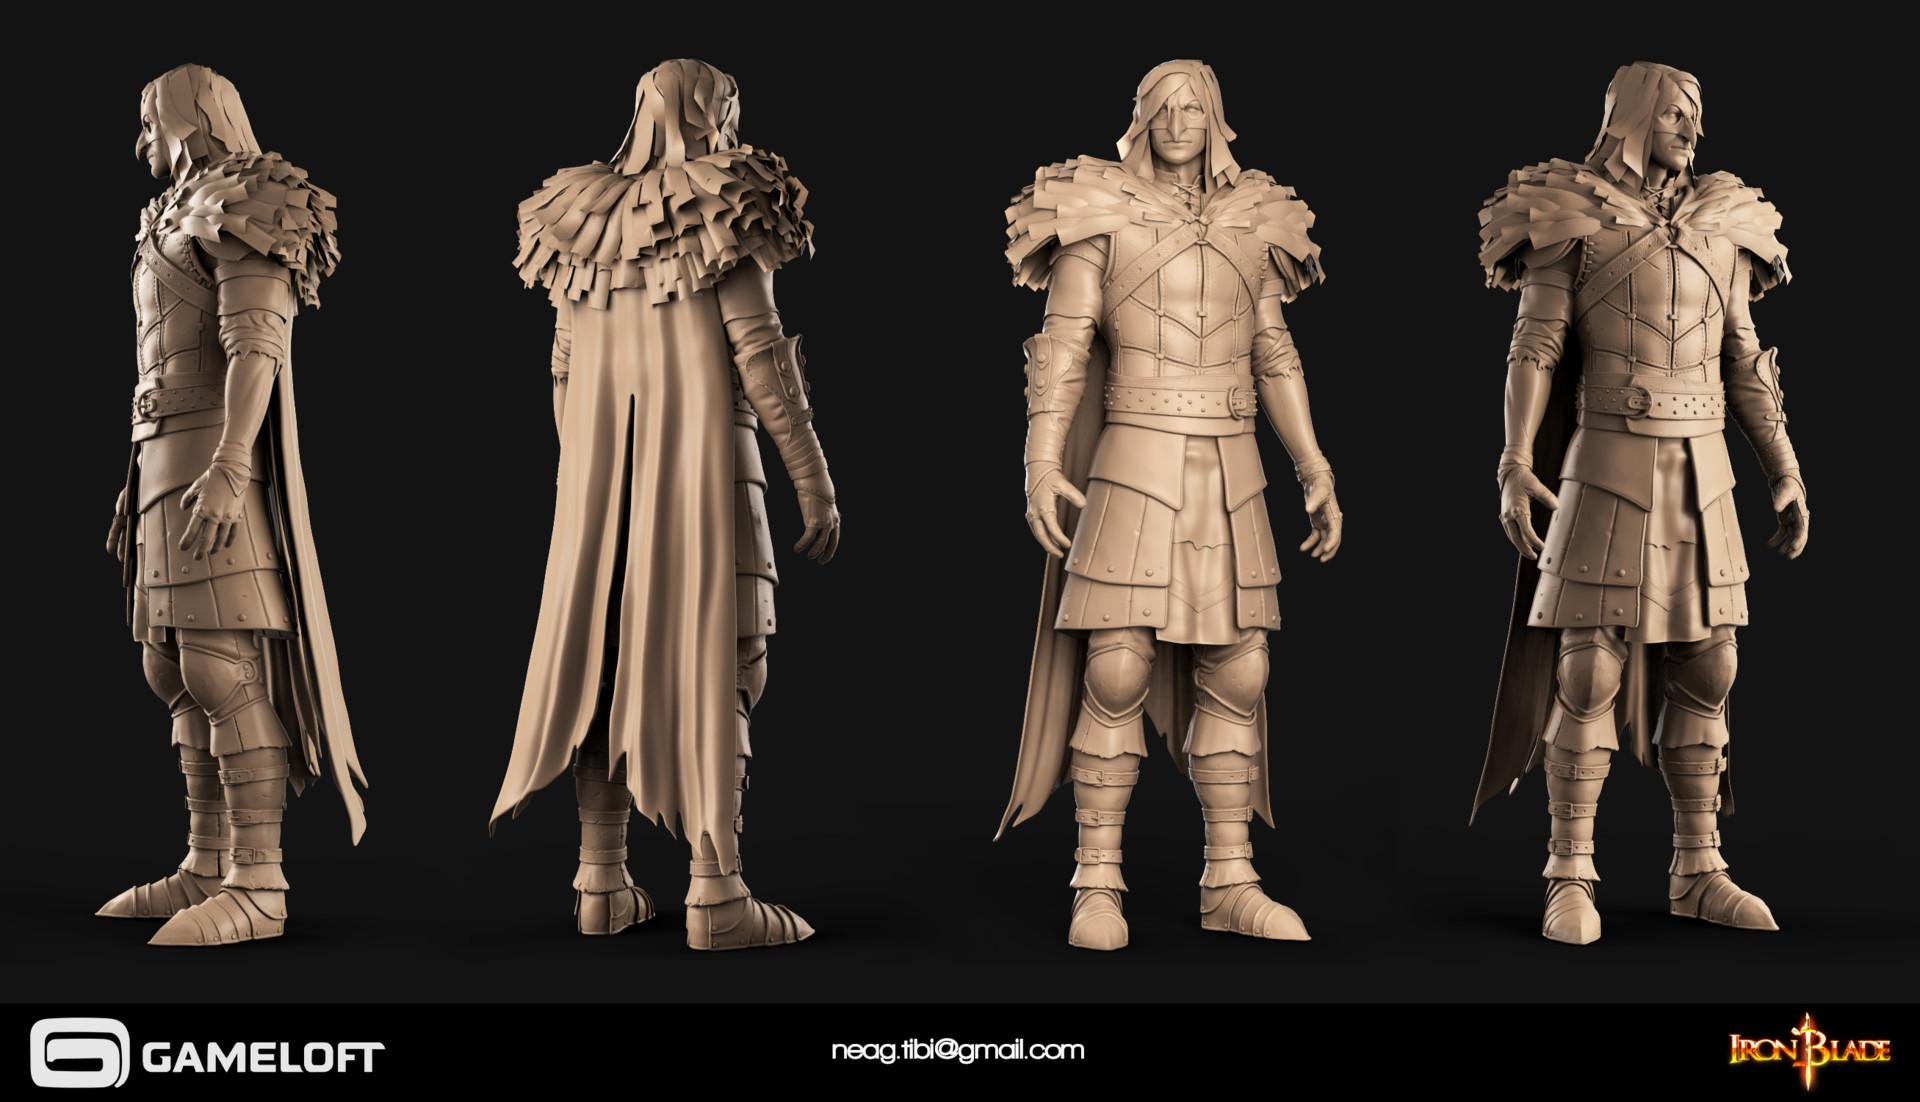 Tibi neag tibi neag iron blade mc armor 11b high poly